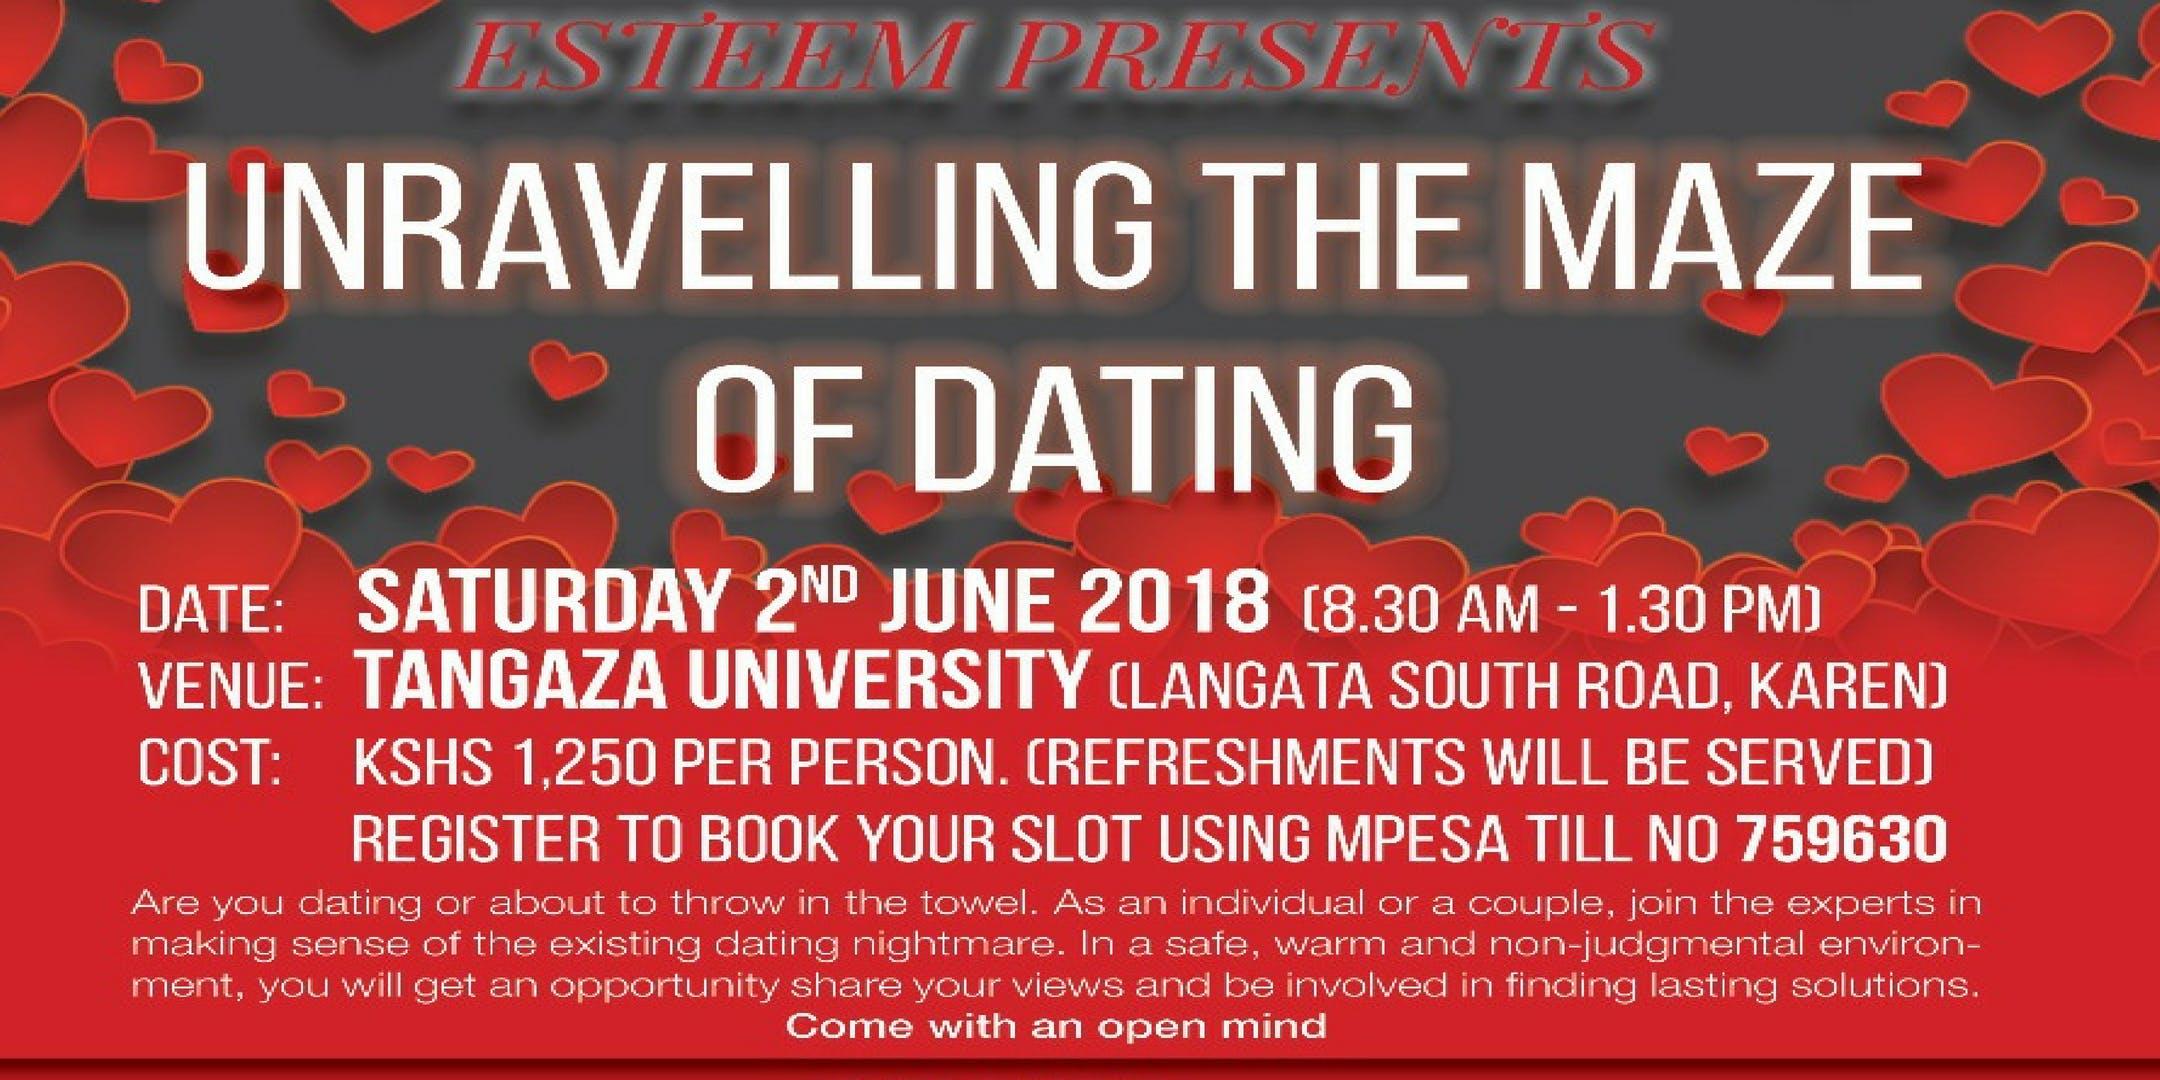 nairobi university dating site define parallel dating